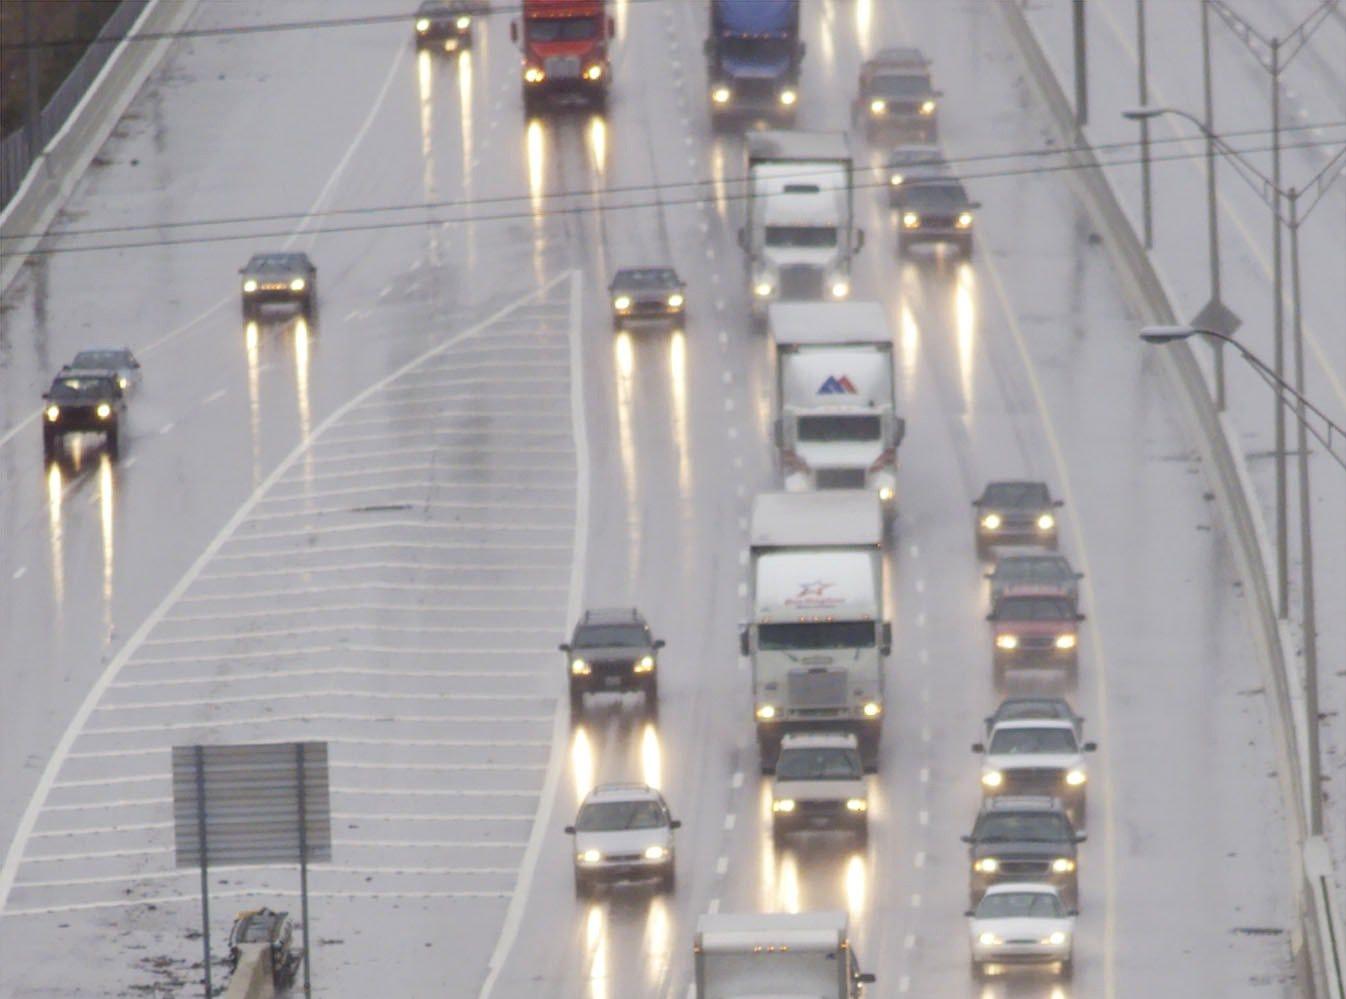 Snow plows spred salt on south bond I-85 Saturday Jan 29, 2000.